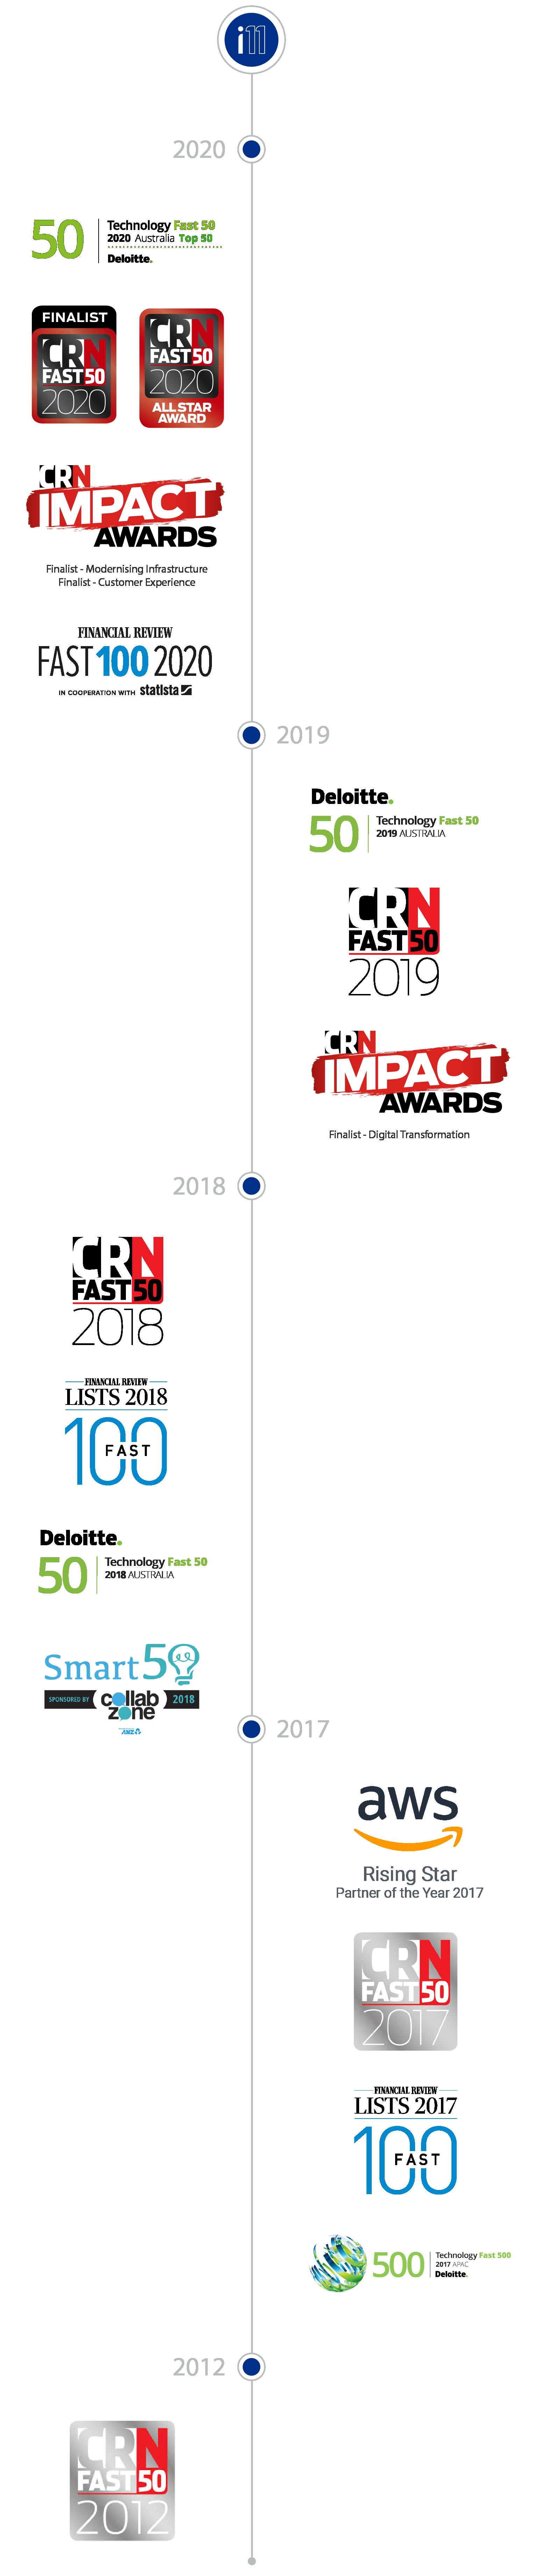 idea11-award-timeline2020-4@2x